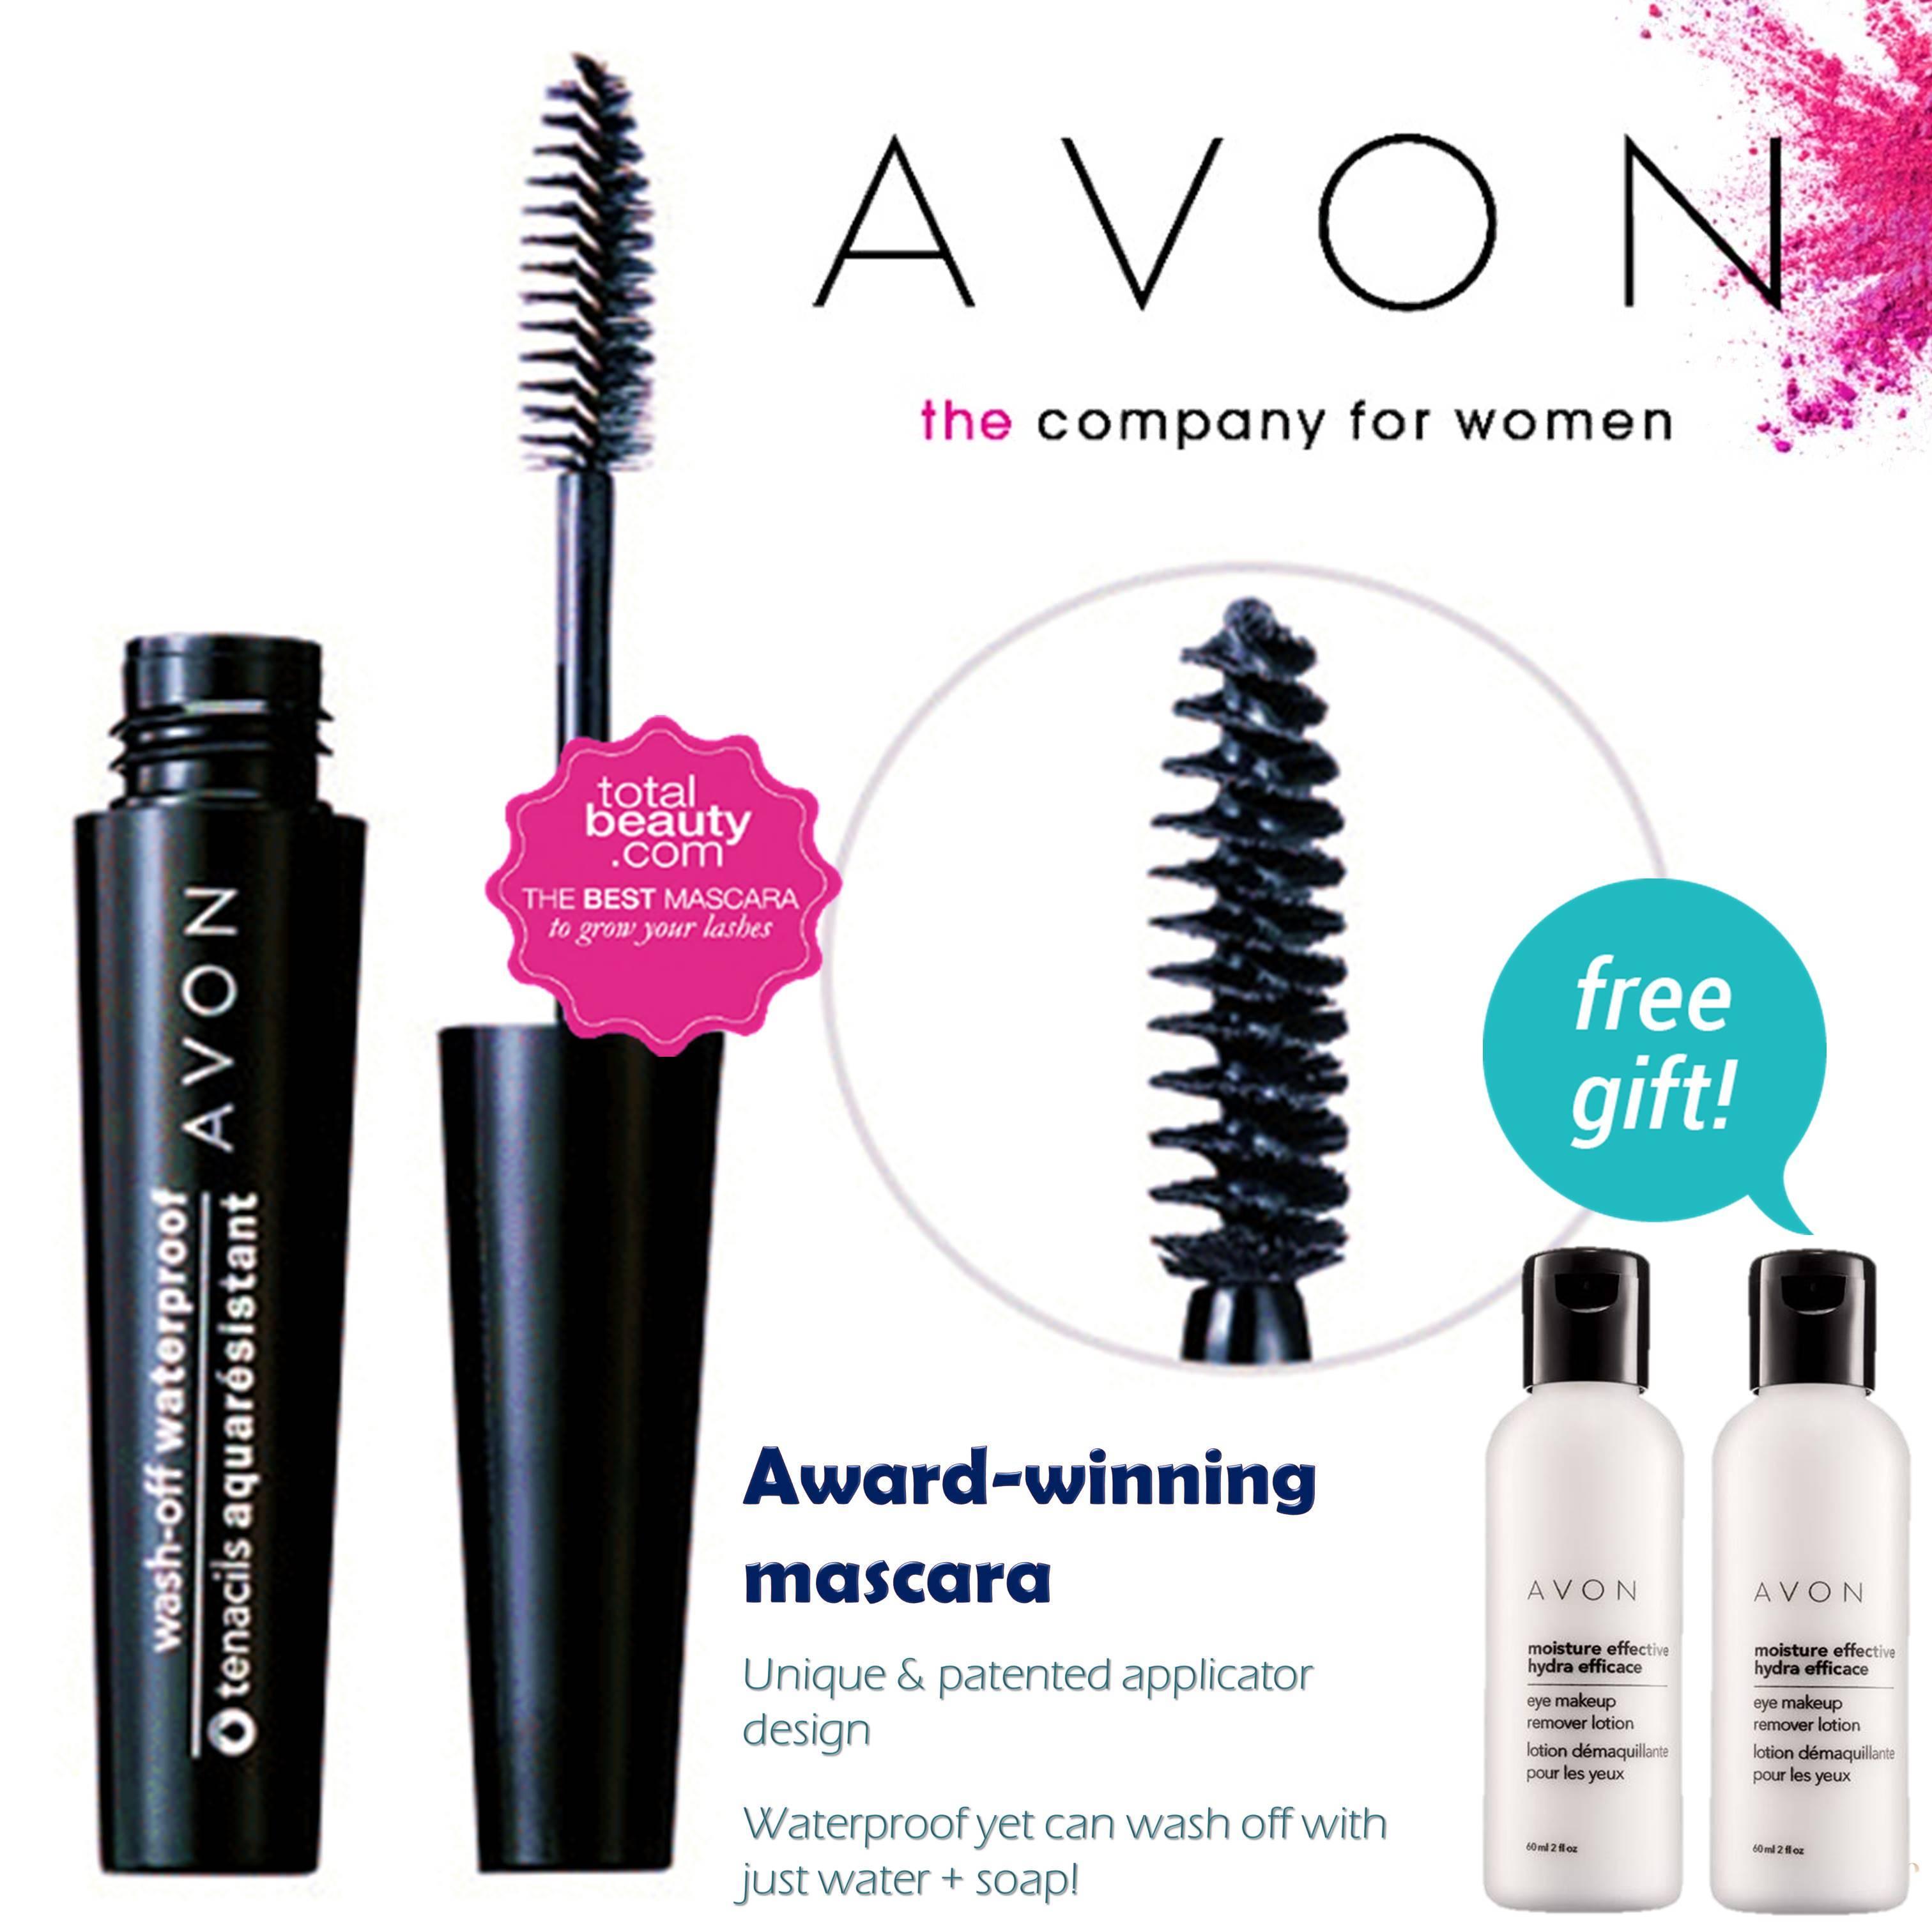 Qoo10 Avon Mascara Cosmetics Avan Av 801 Headset Headphone Fit To Viewer